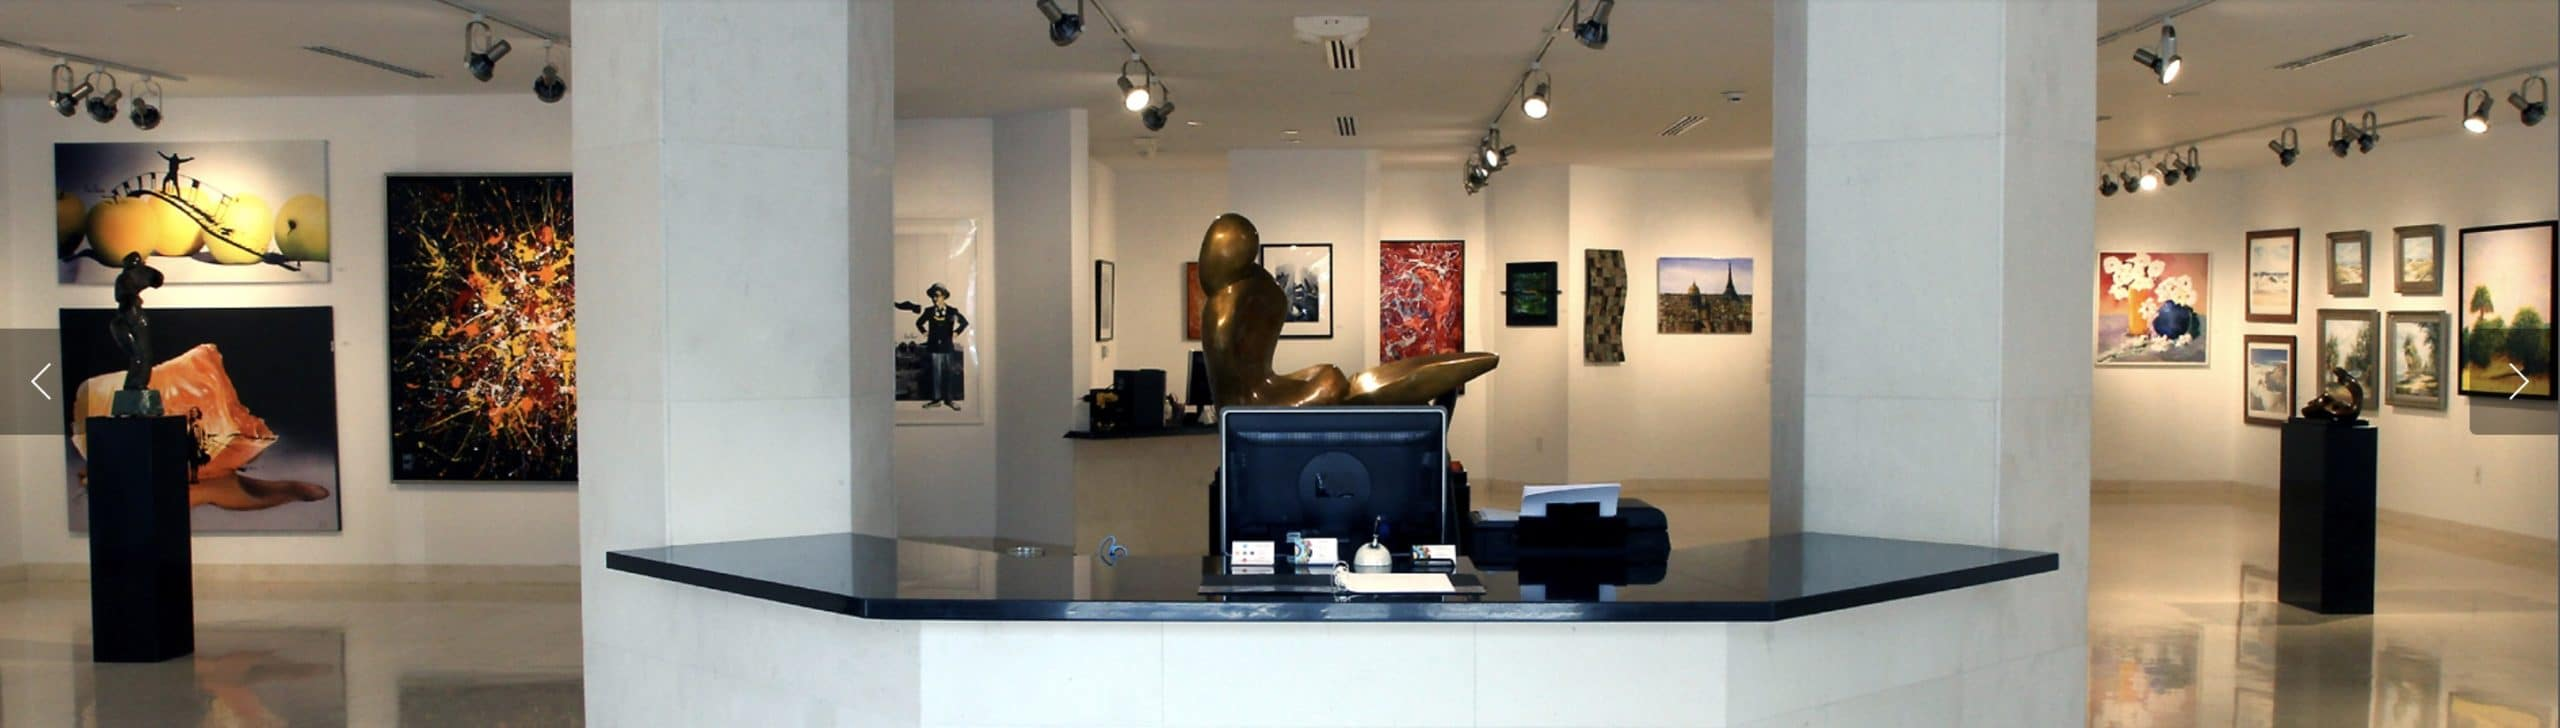 Artblend Gallery Representation